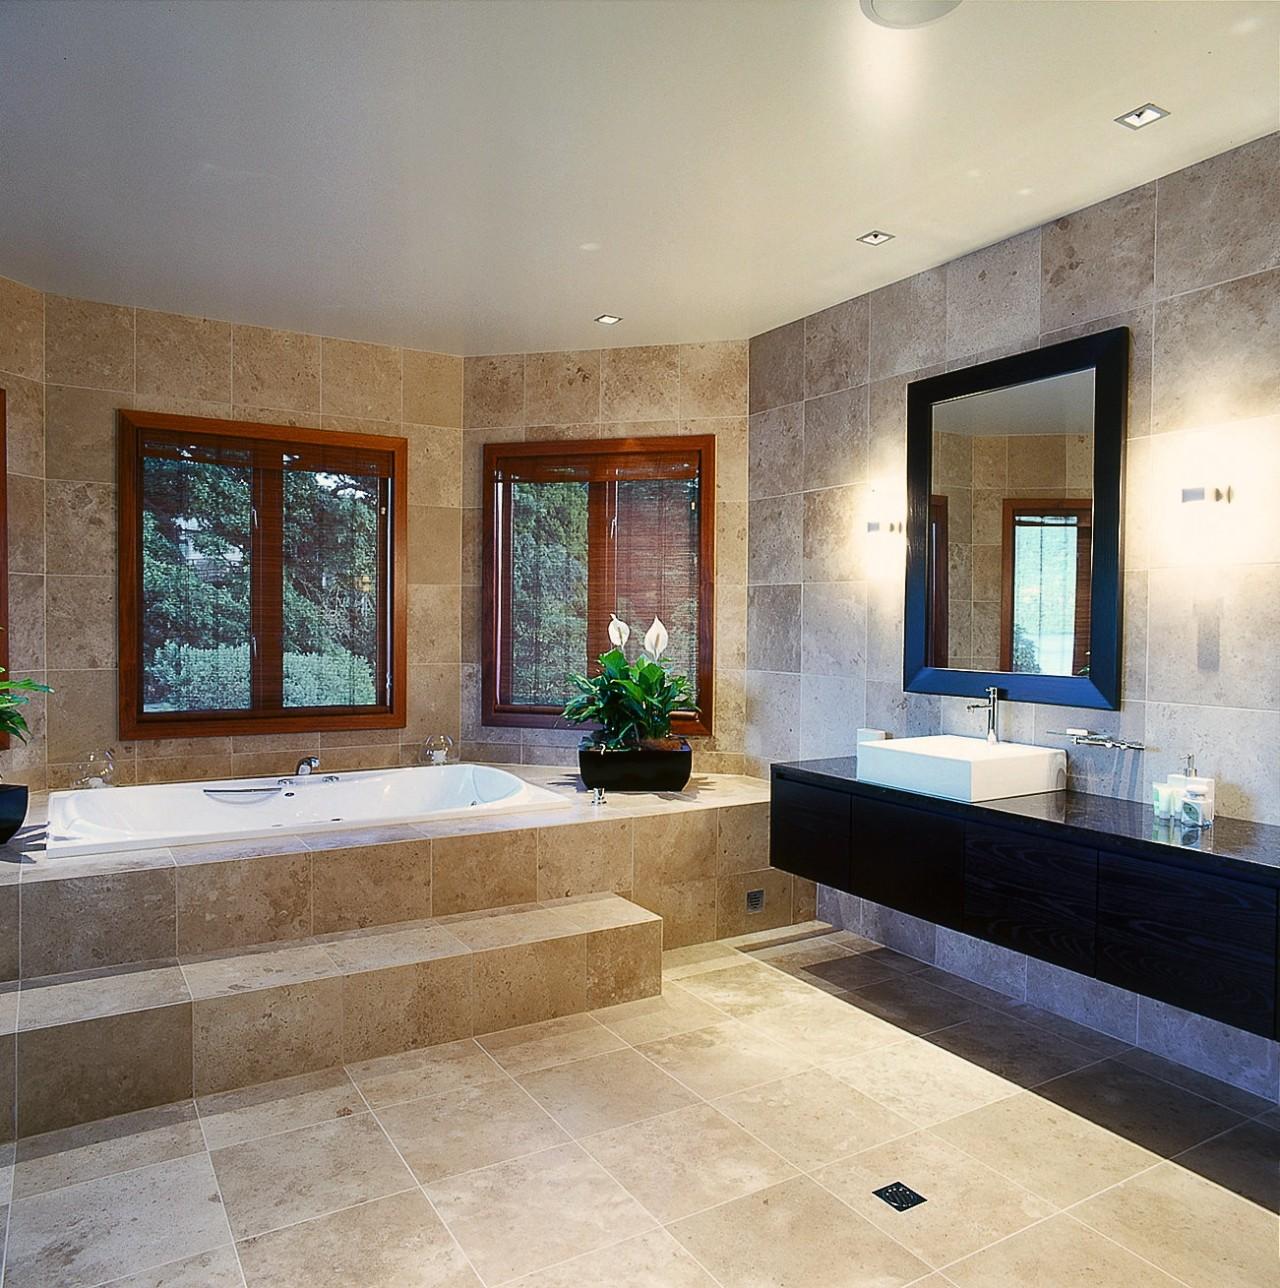 View of the spacious and fully tiled bathroom. bathroom, ceiling, estate, floor, flooring, home, interior design, lobby, property, real estate, room, tile, wall, window, wood flooring, orange, gray